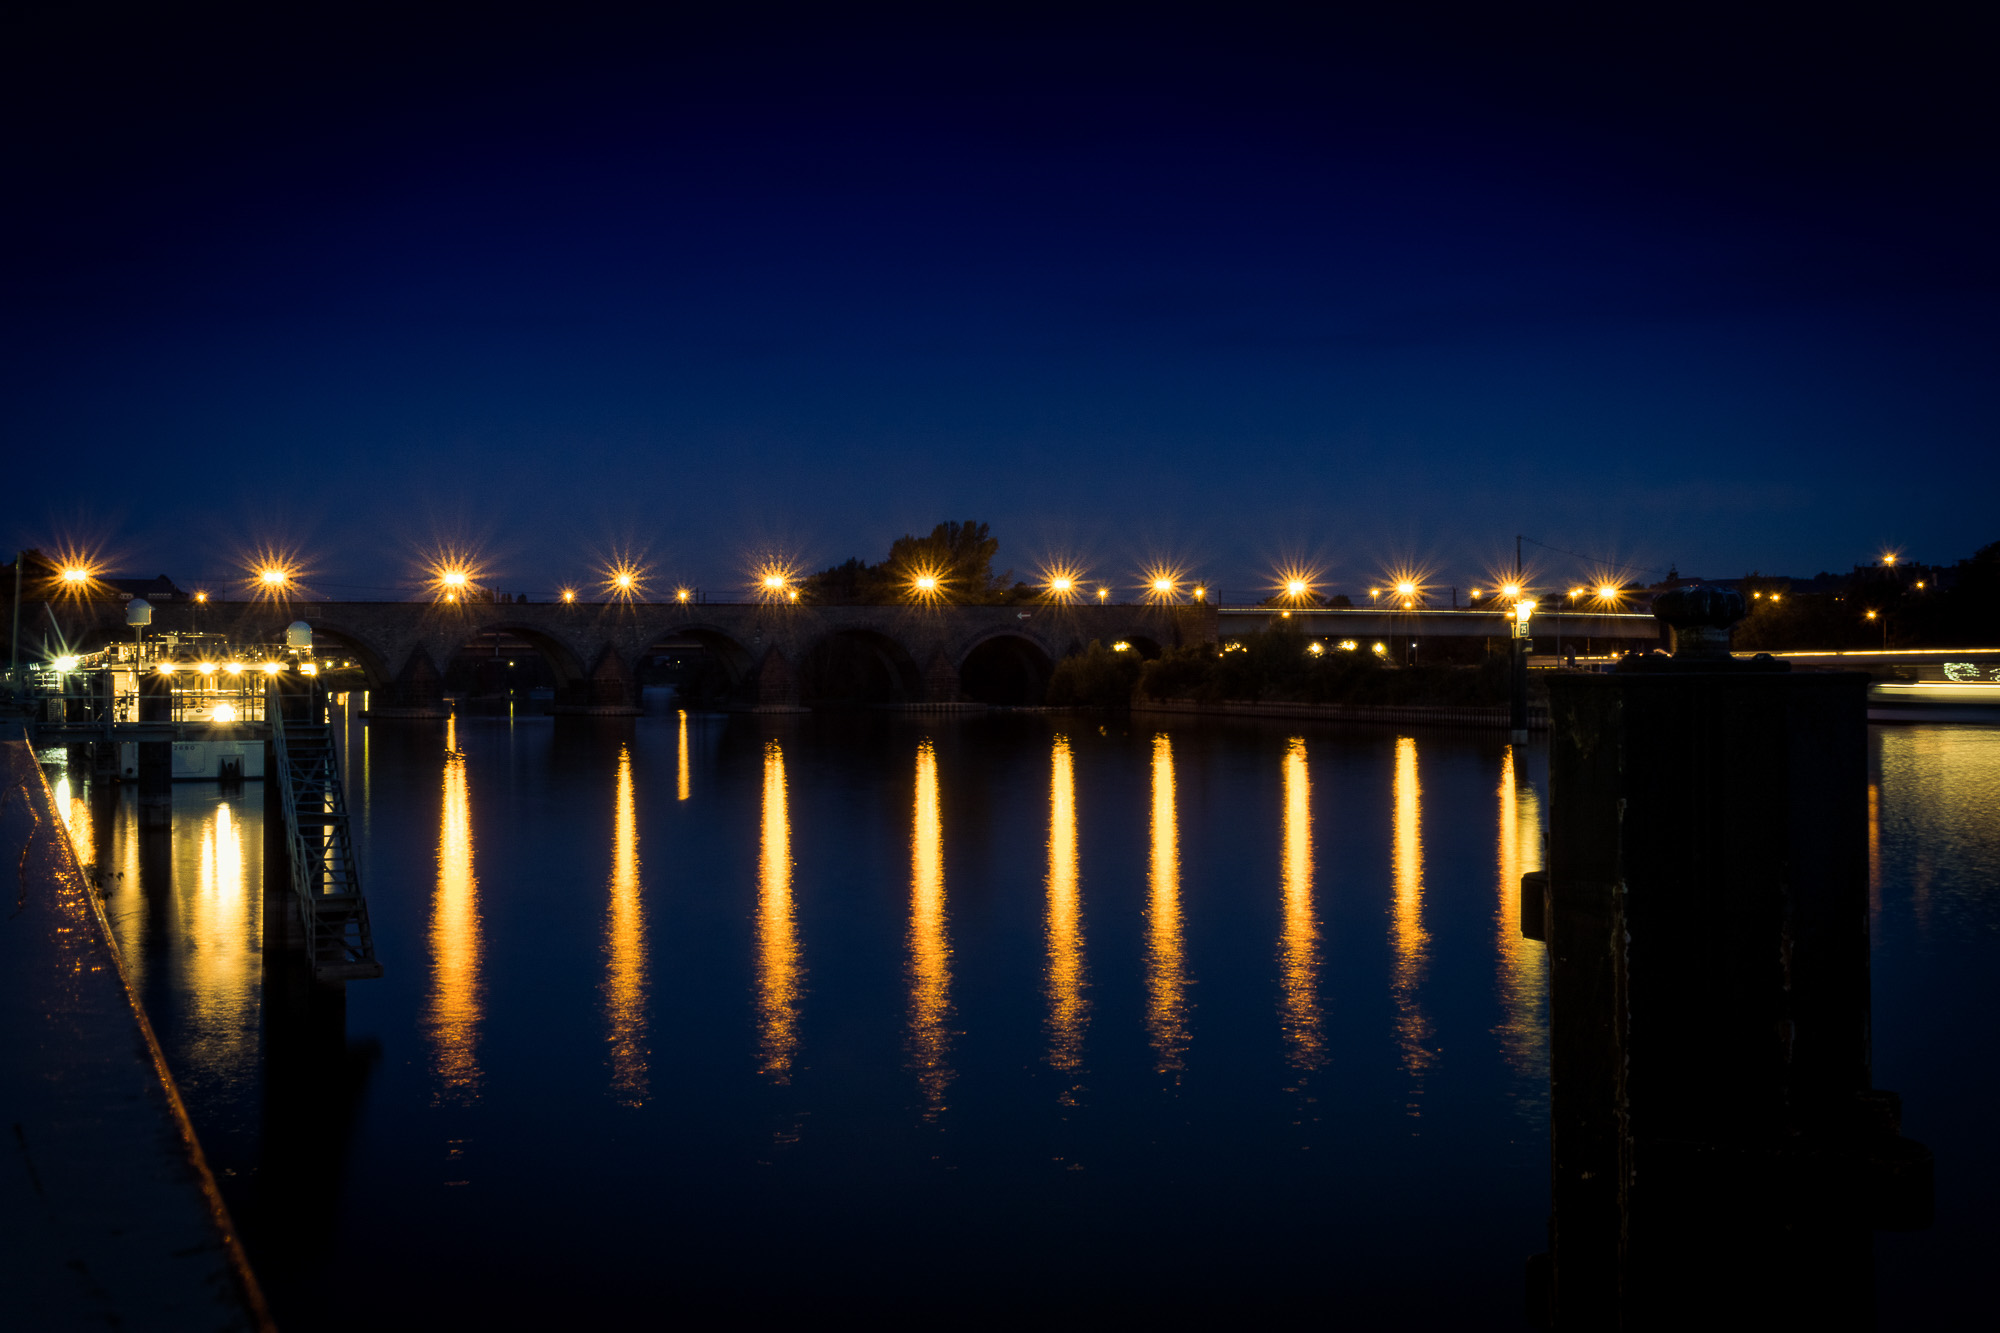 dabu / Balduinbrücke